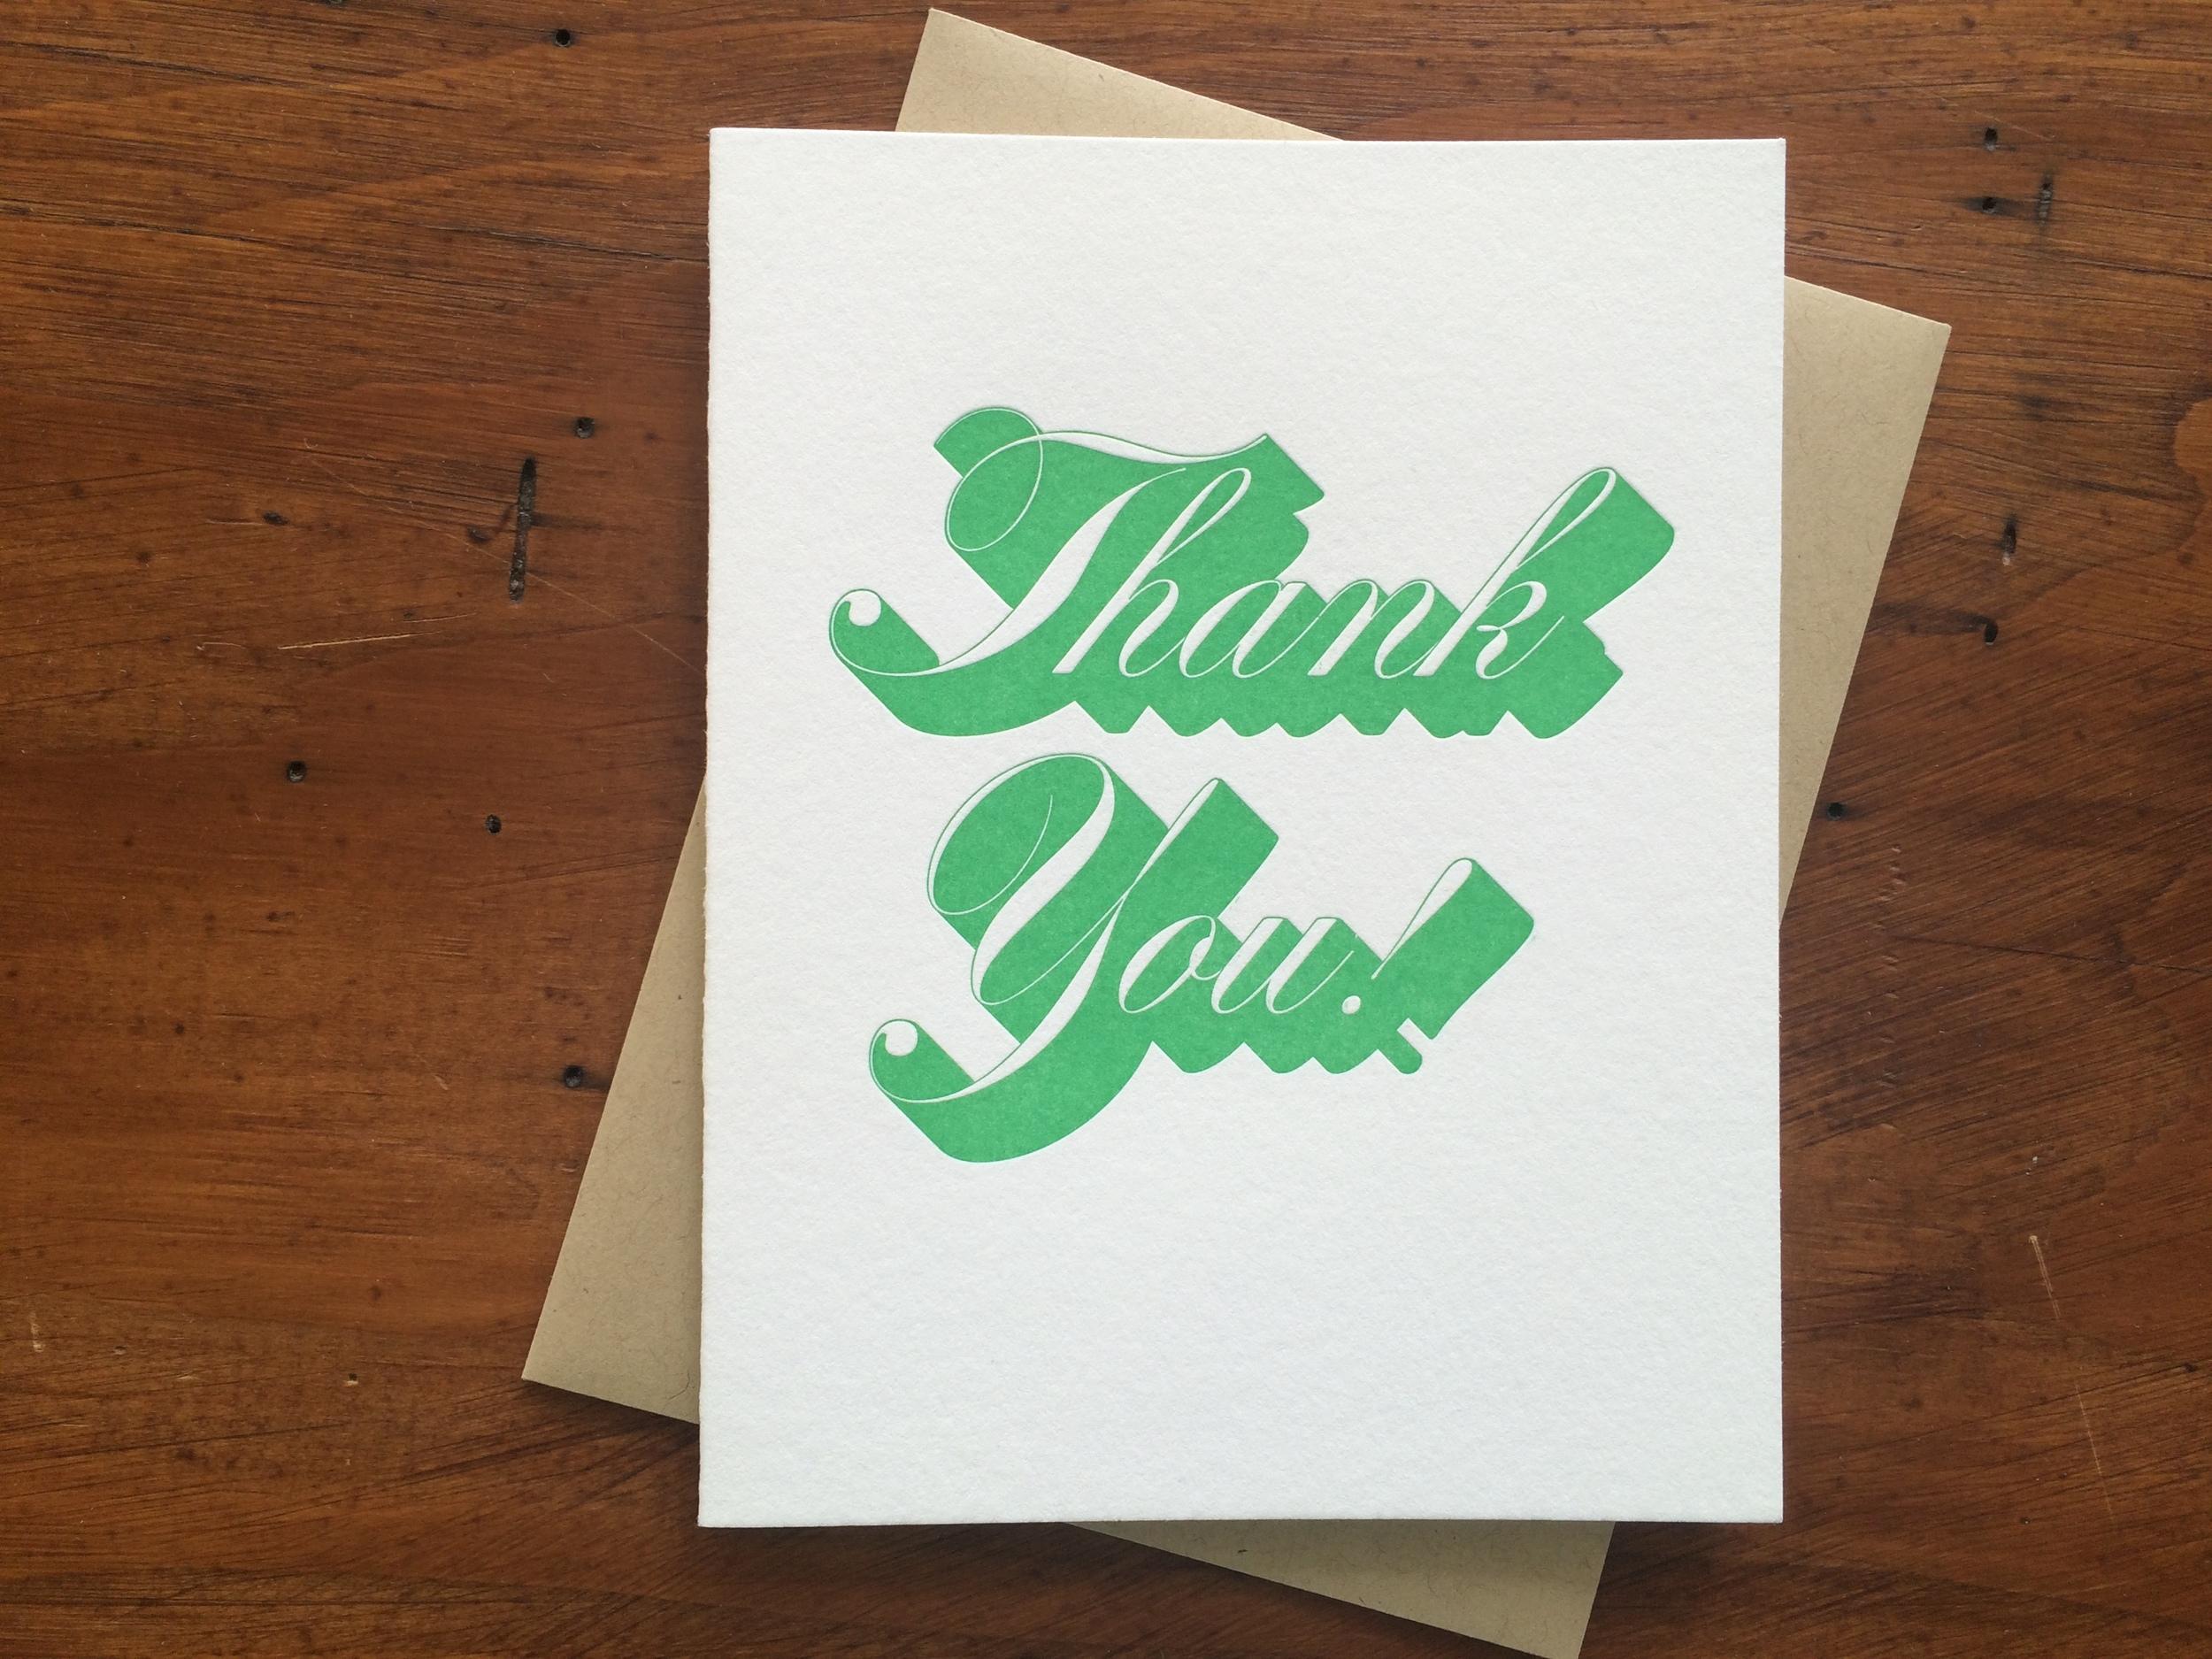 drop thank you.jpg